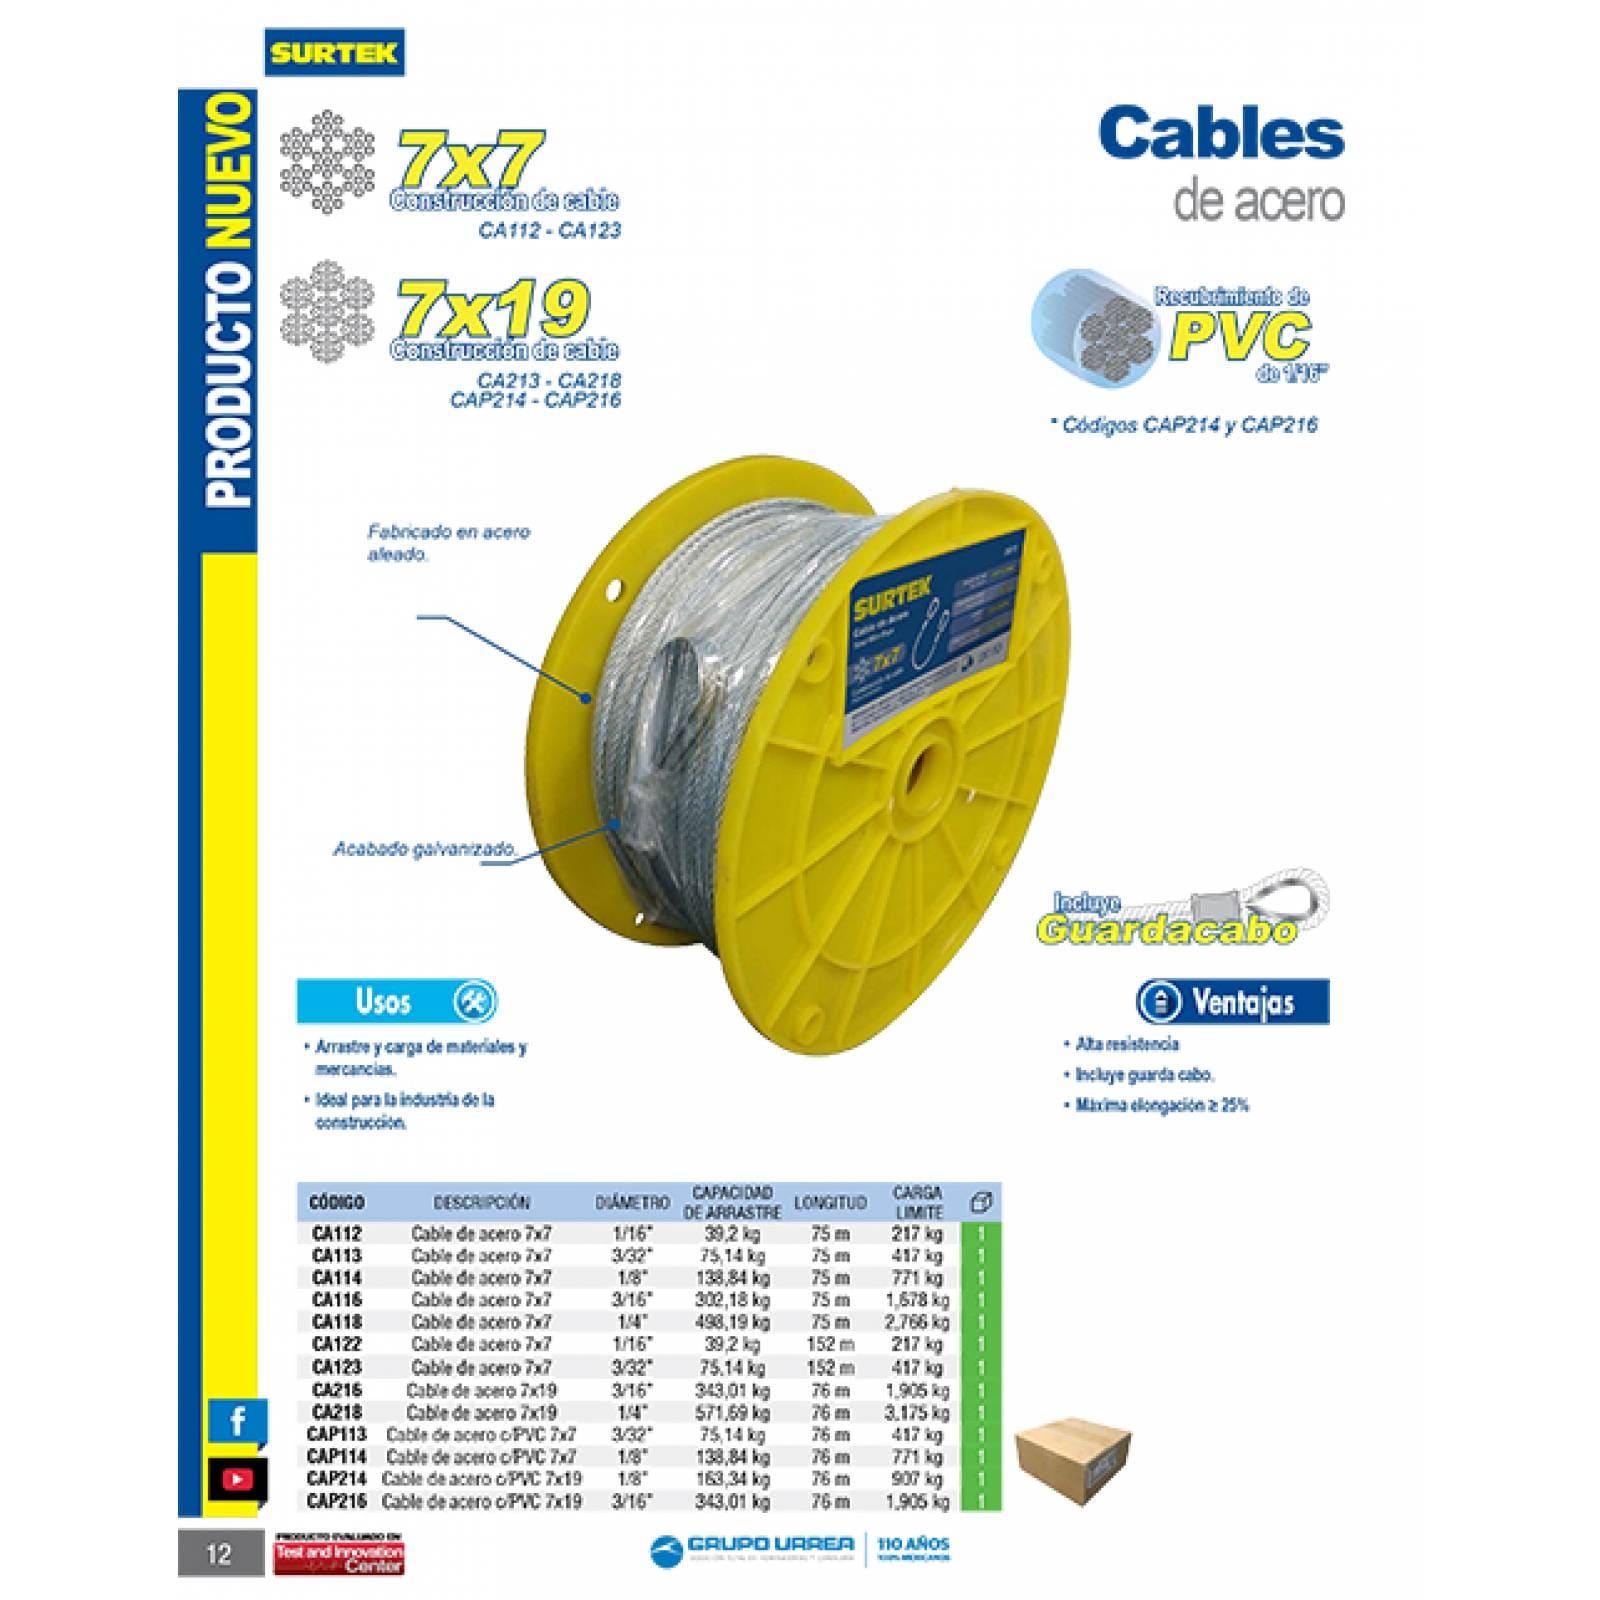 "Cable Acero 7X7 3/32""X152M CA123 Surtek"